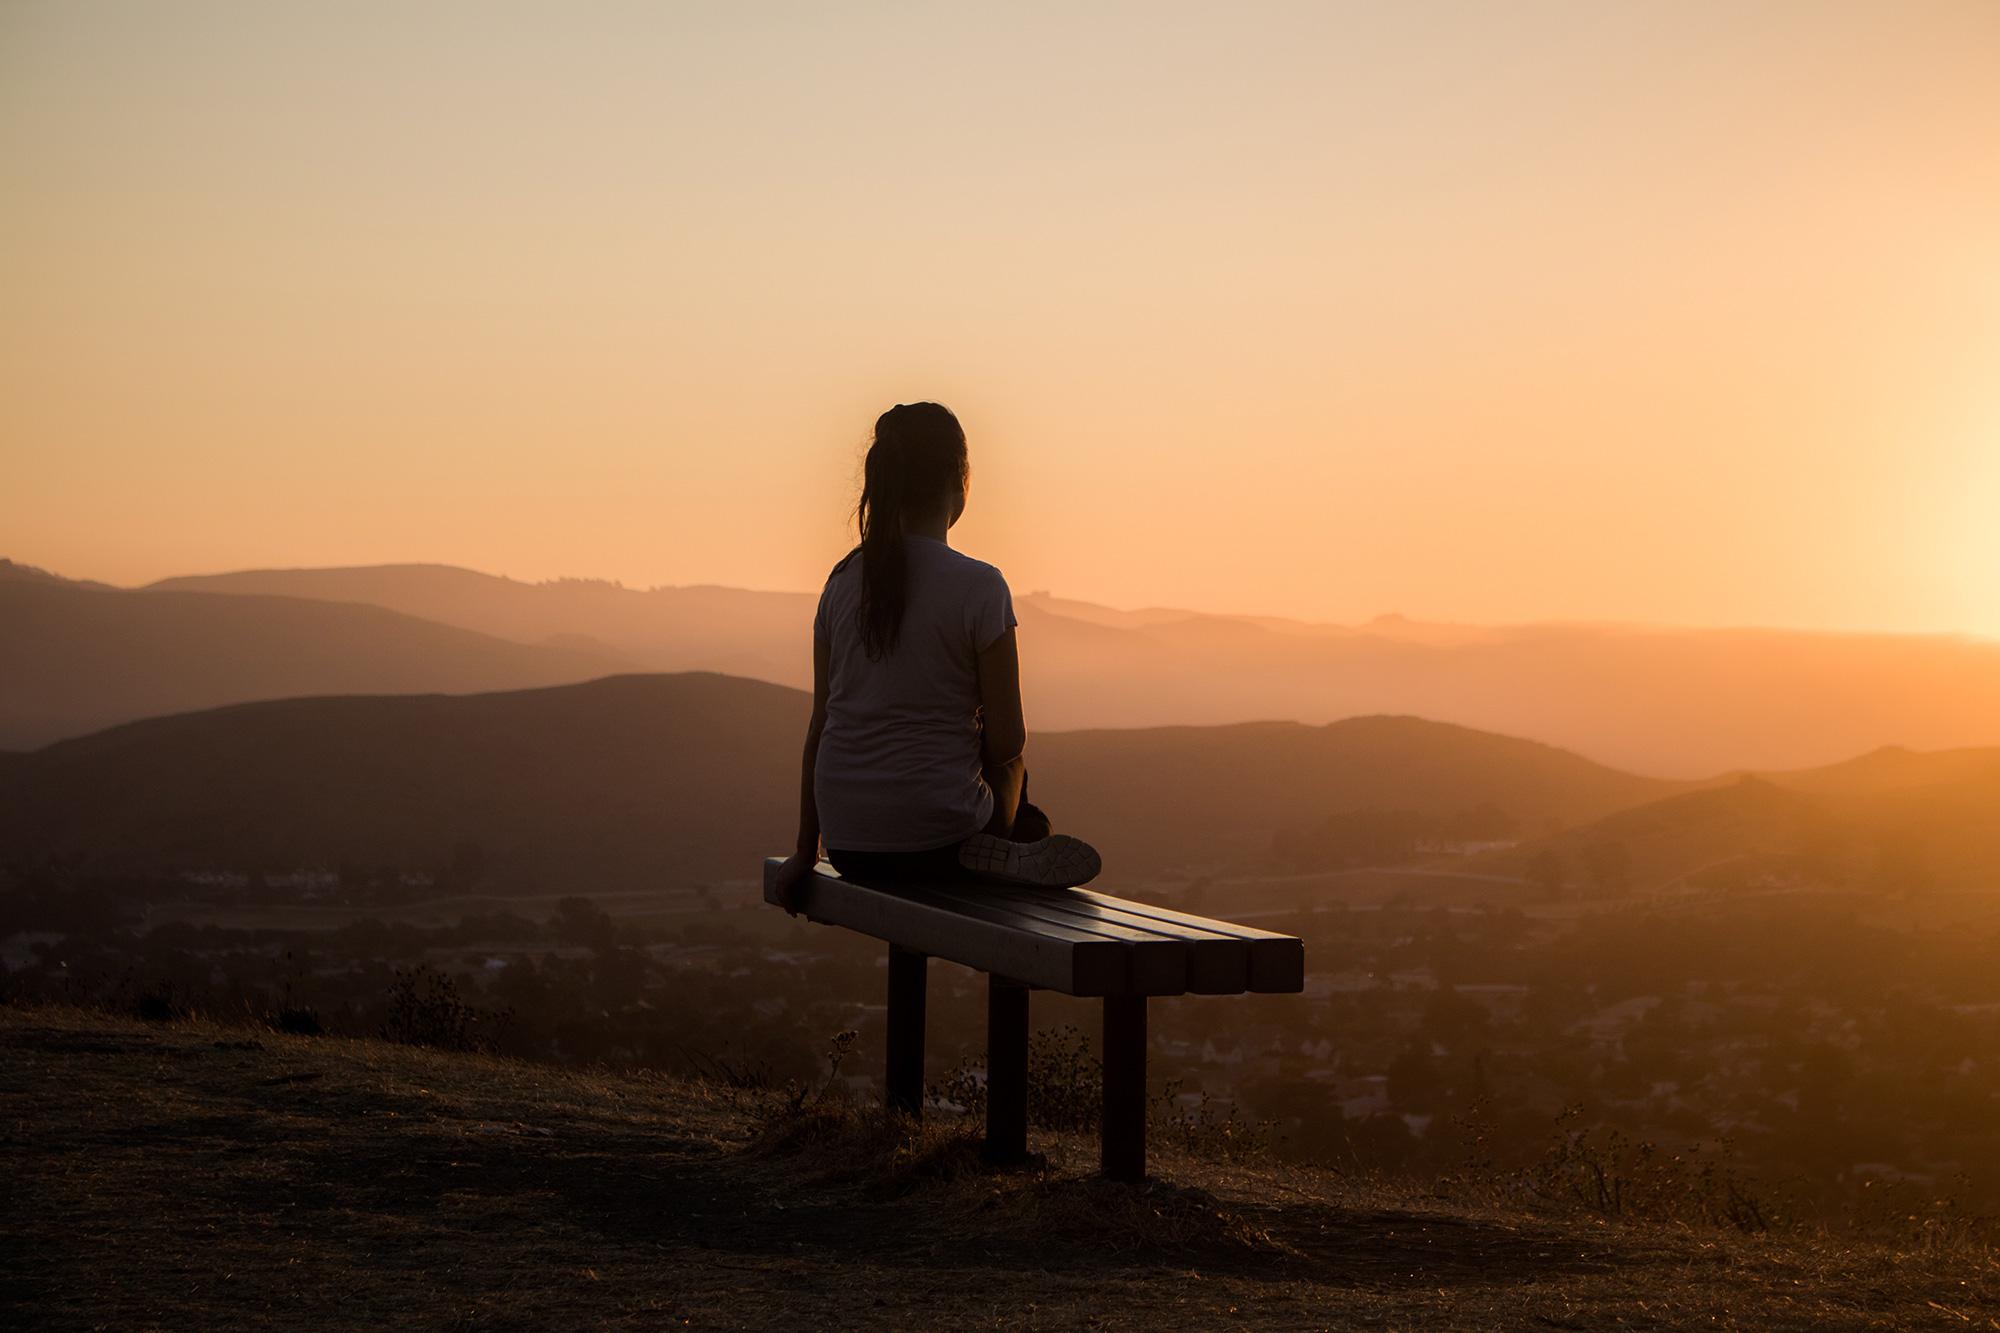 A challenge can help develop a strong mindset